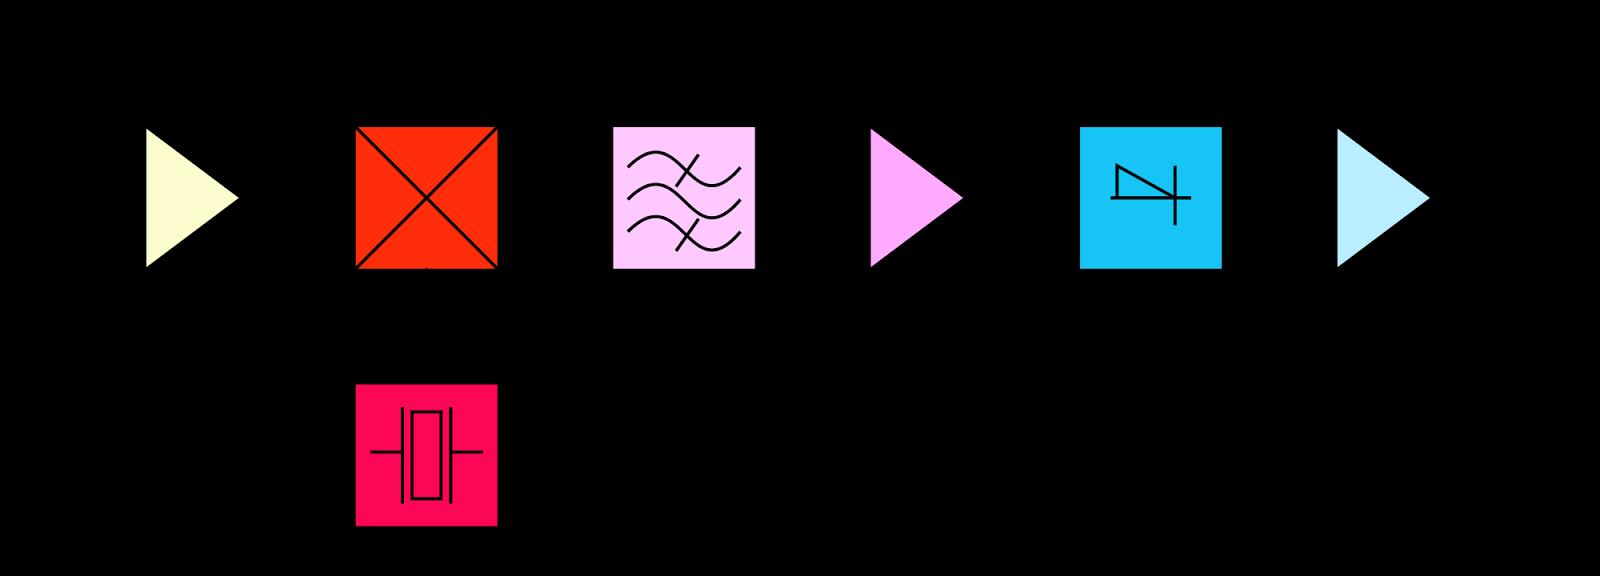 basic radio block diagram [ 1600 x 576 Pixel ]